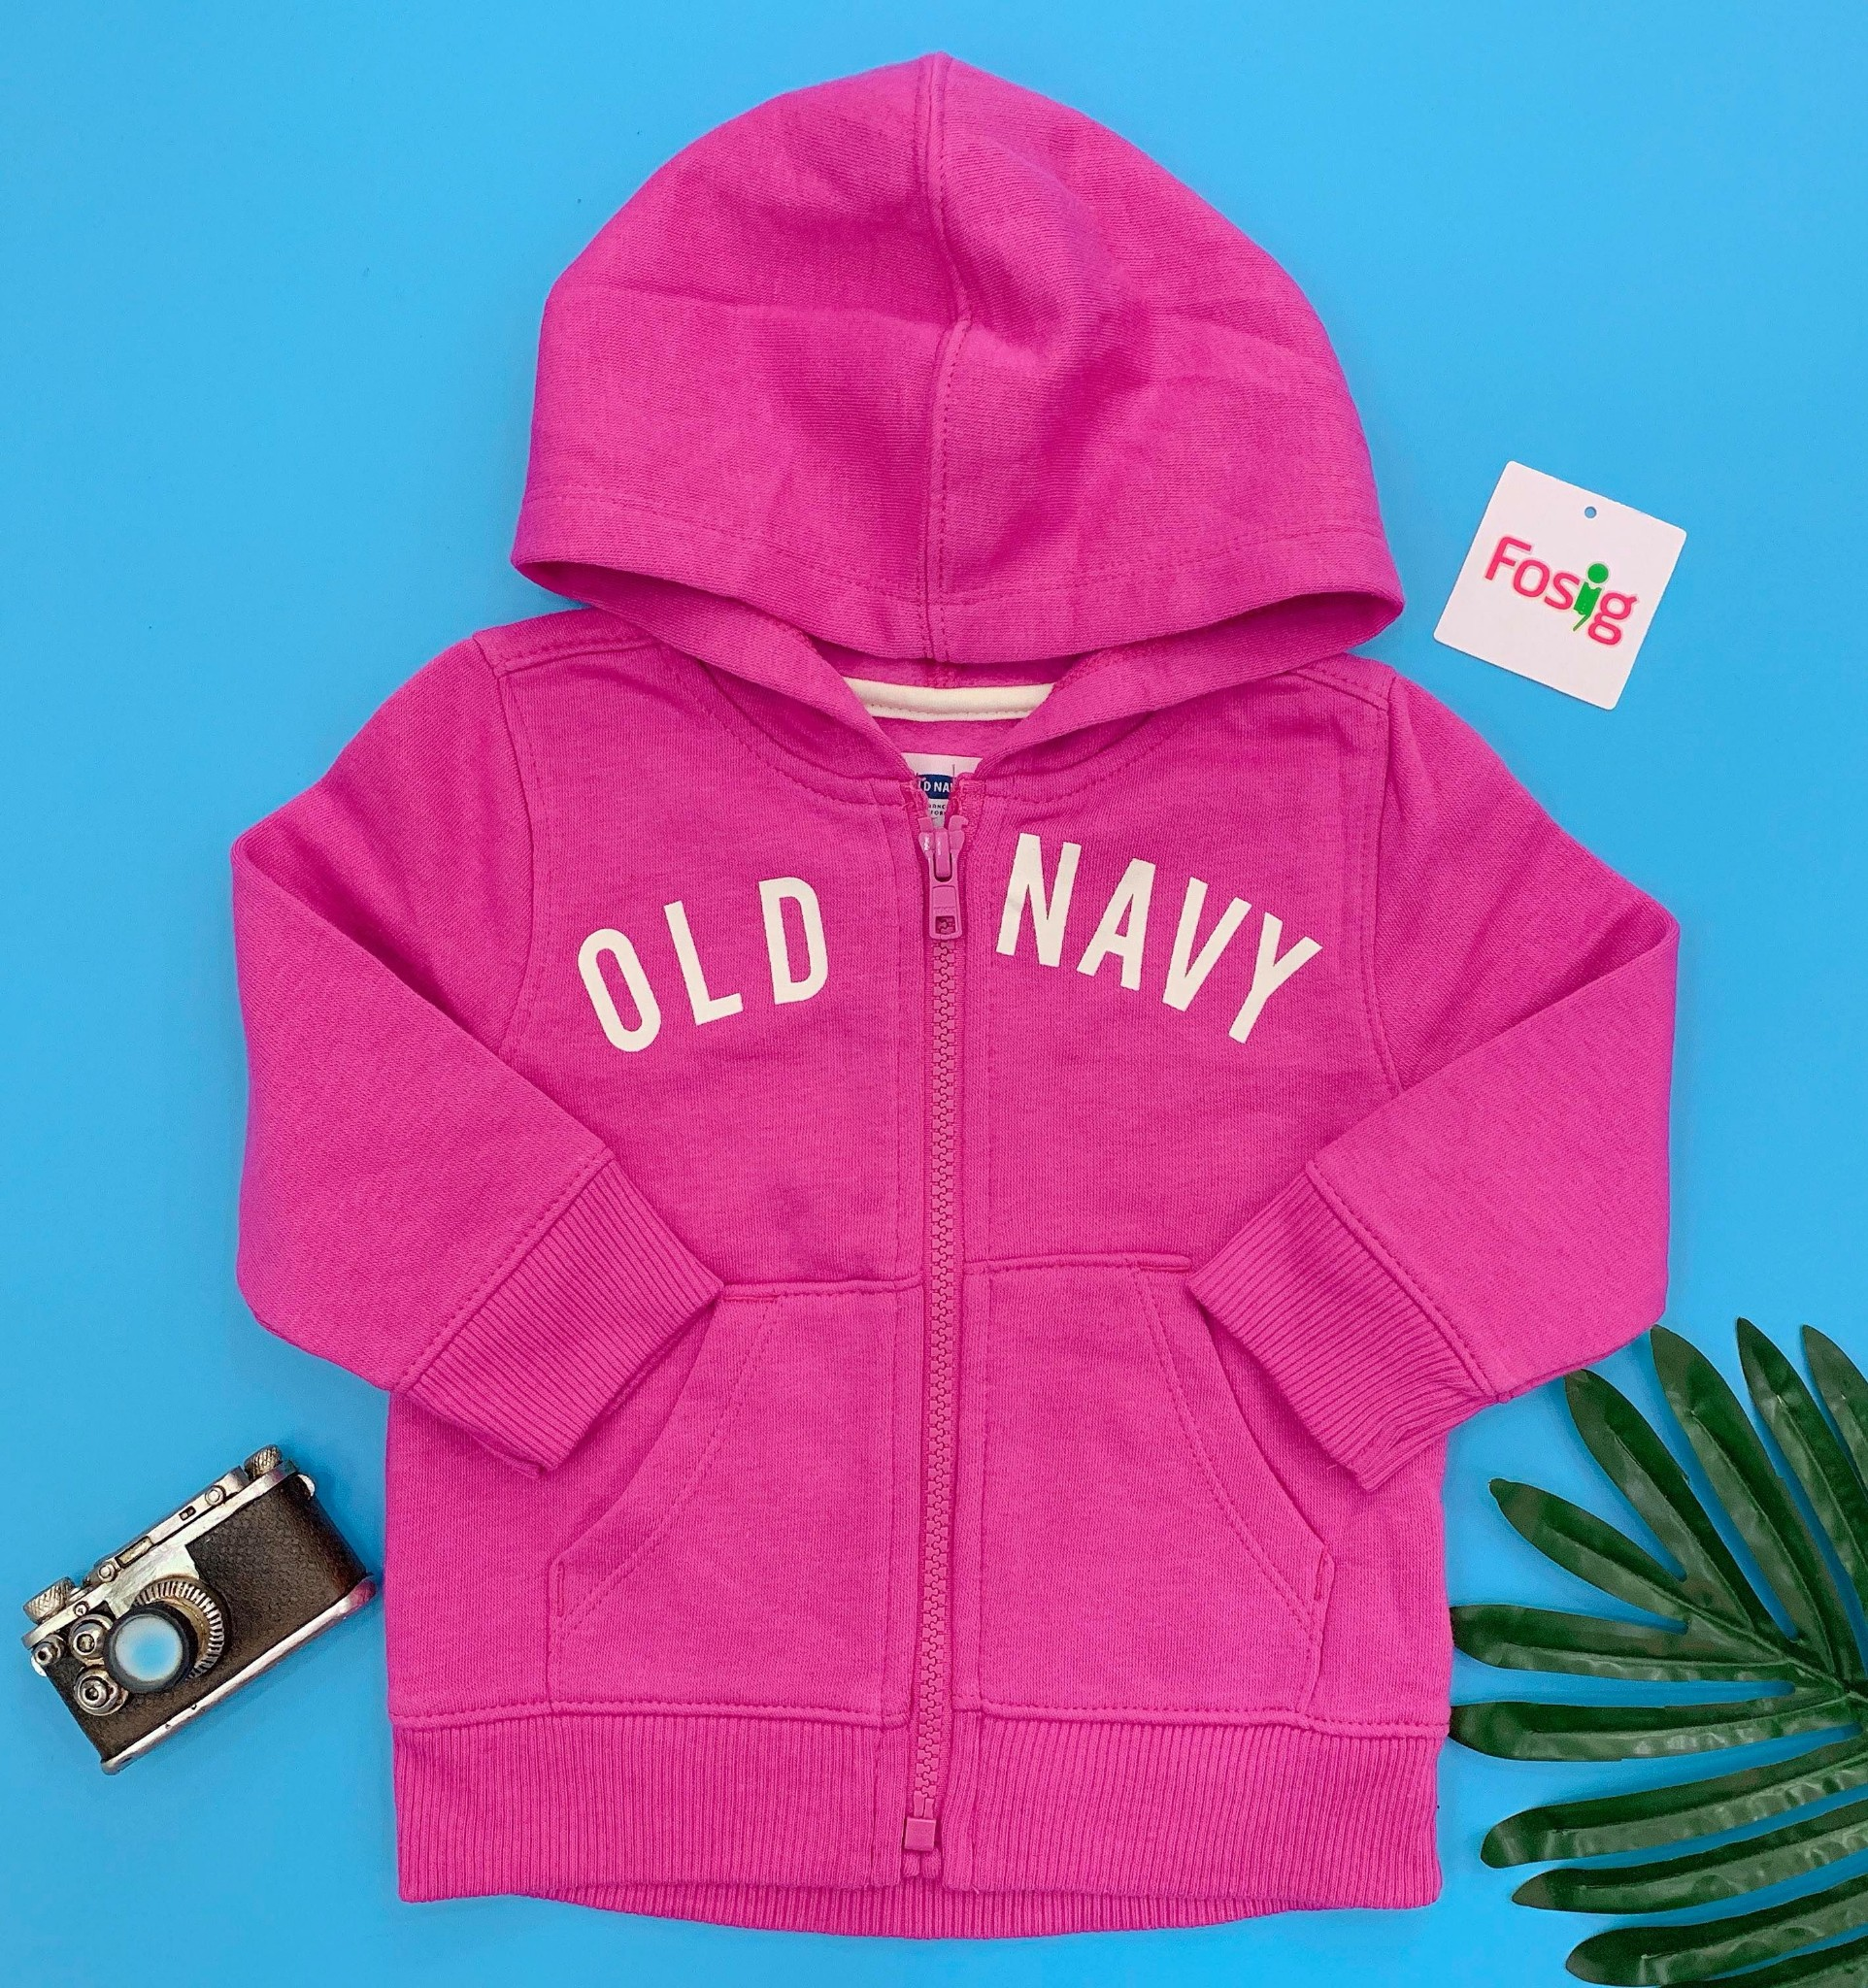 [9-17kg] Áo Khoác Old Navy [Girl] - Hồng Đậm/Old Navy